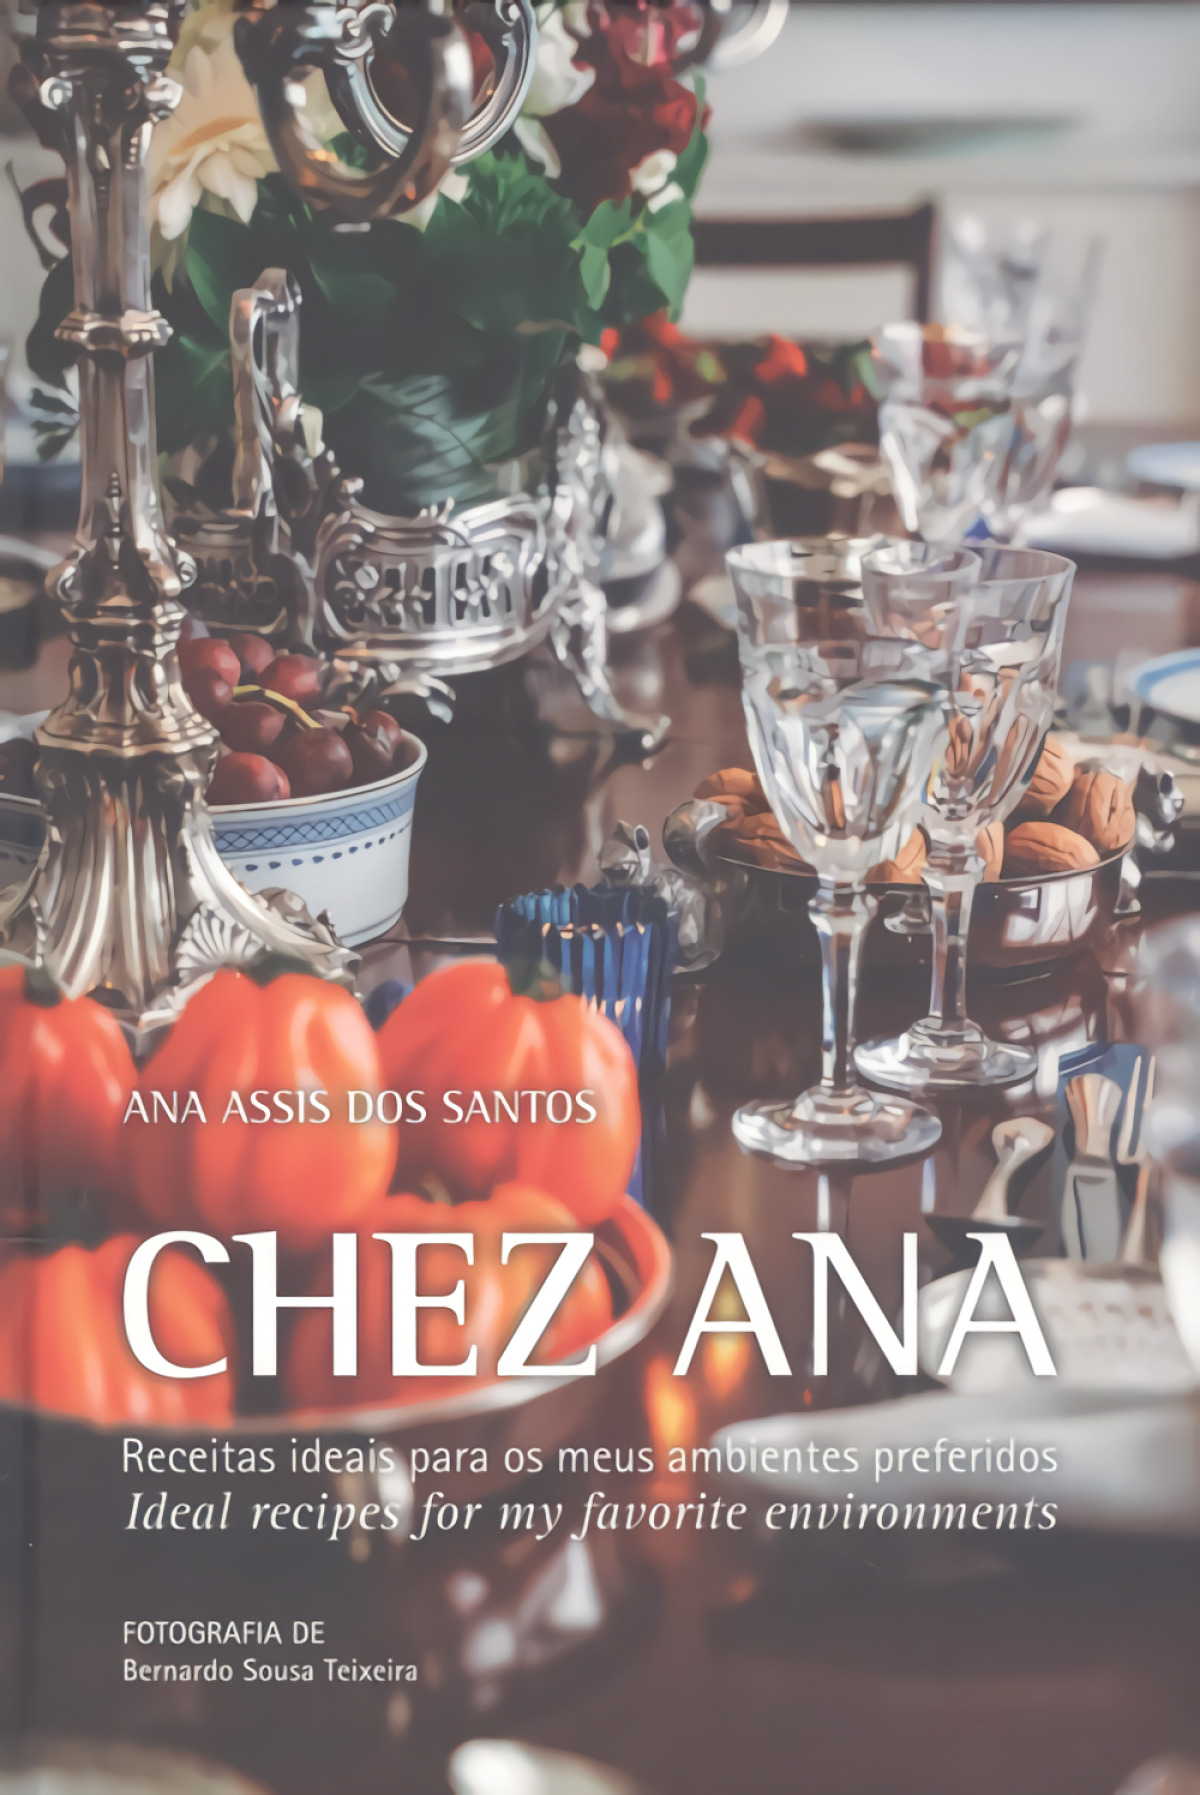 CHEZ ANA: RECEITAS IDEAIS PARA OS MEUS AMBIENTES PREFERIDOS